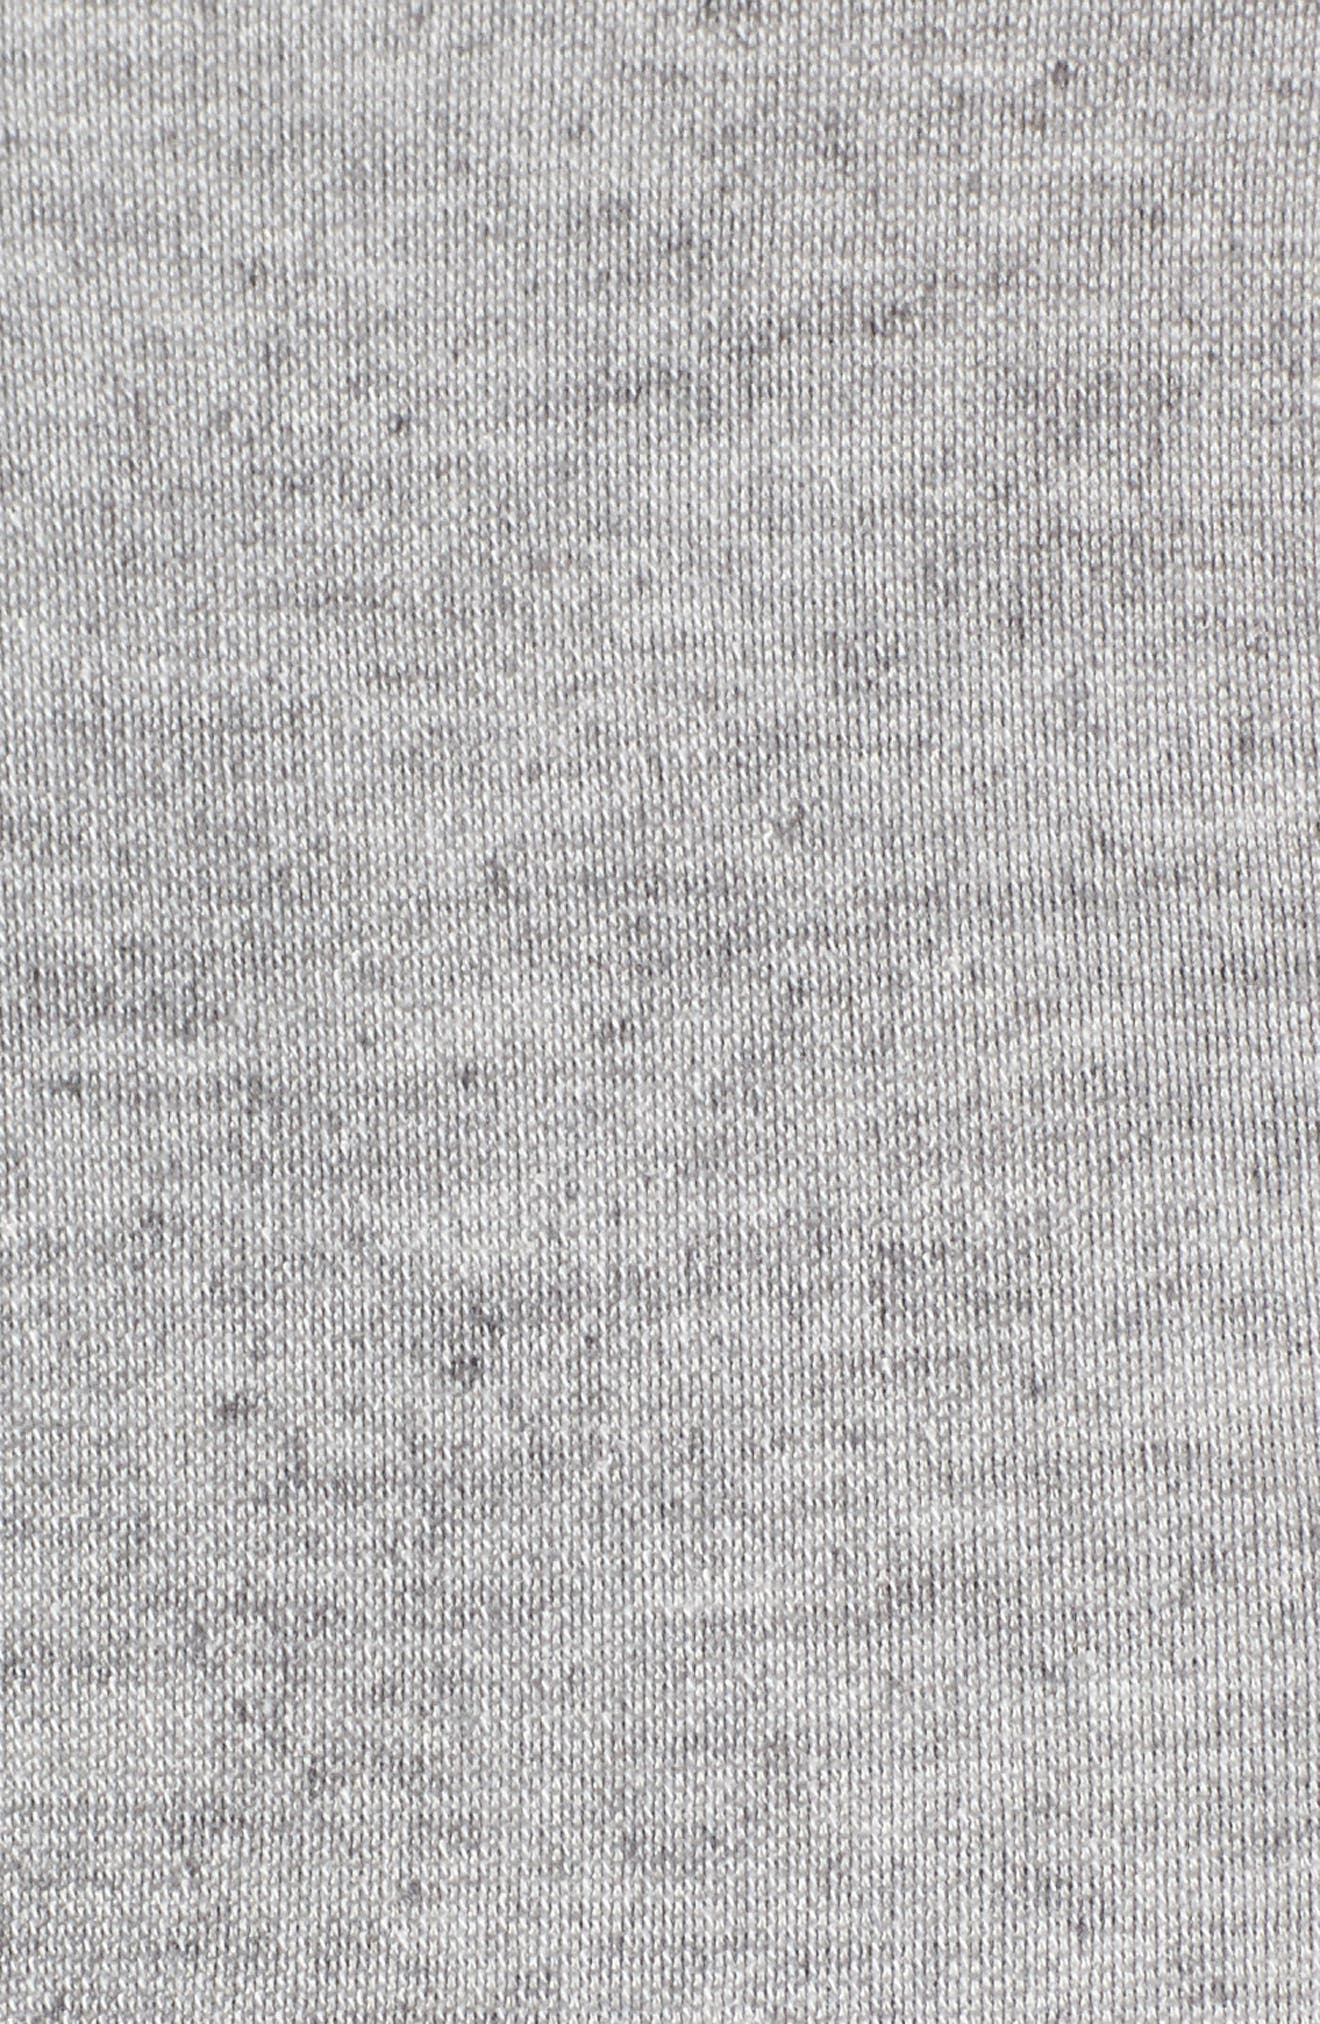 Gathered Waist Front Zip Jacket,                             Alternate thumbnail 17, color,